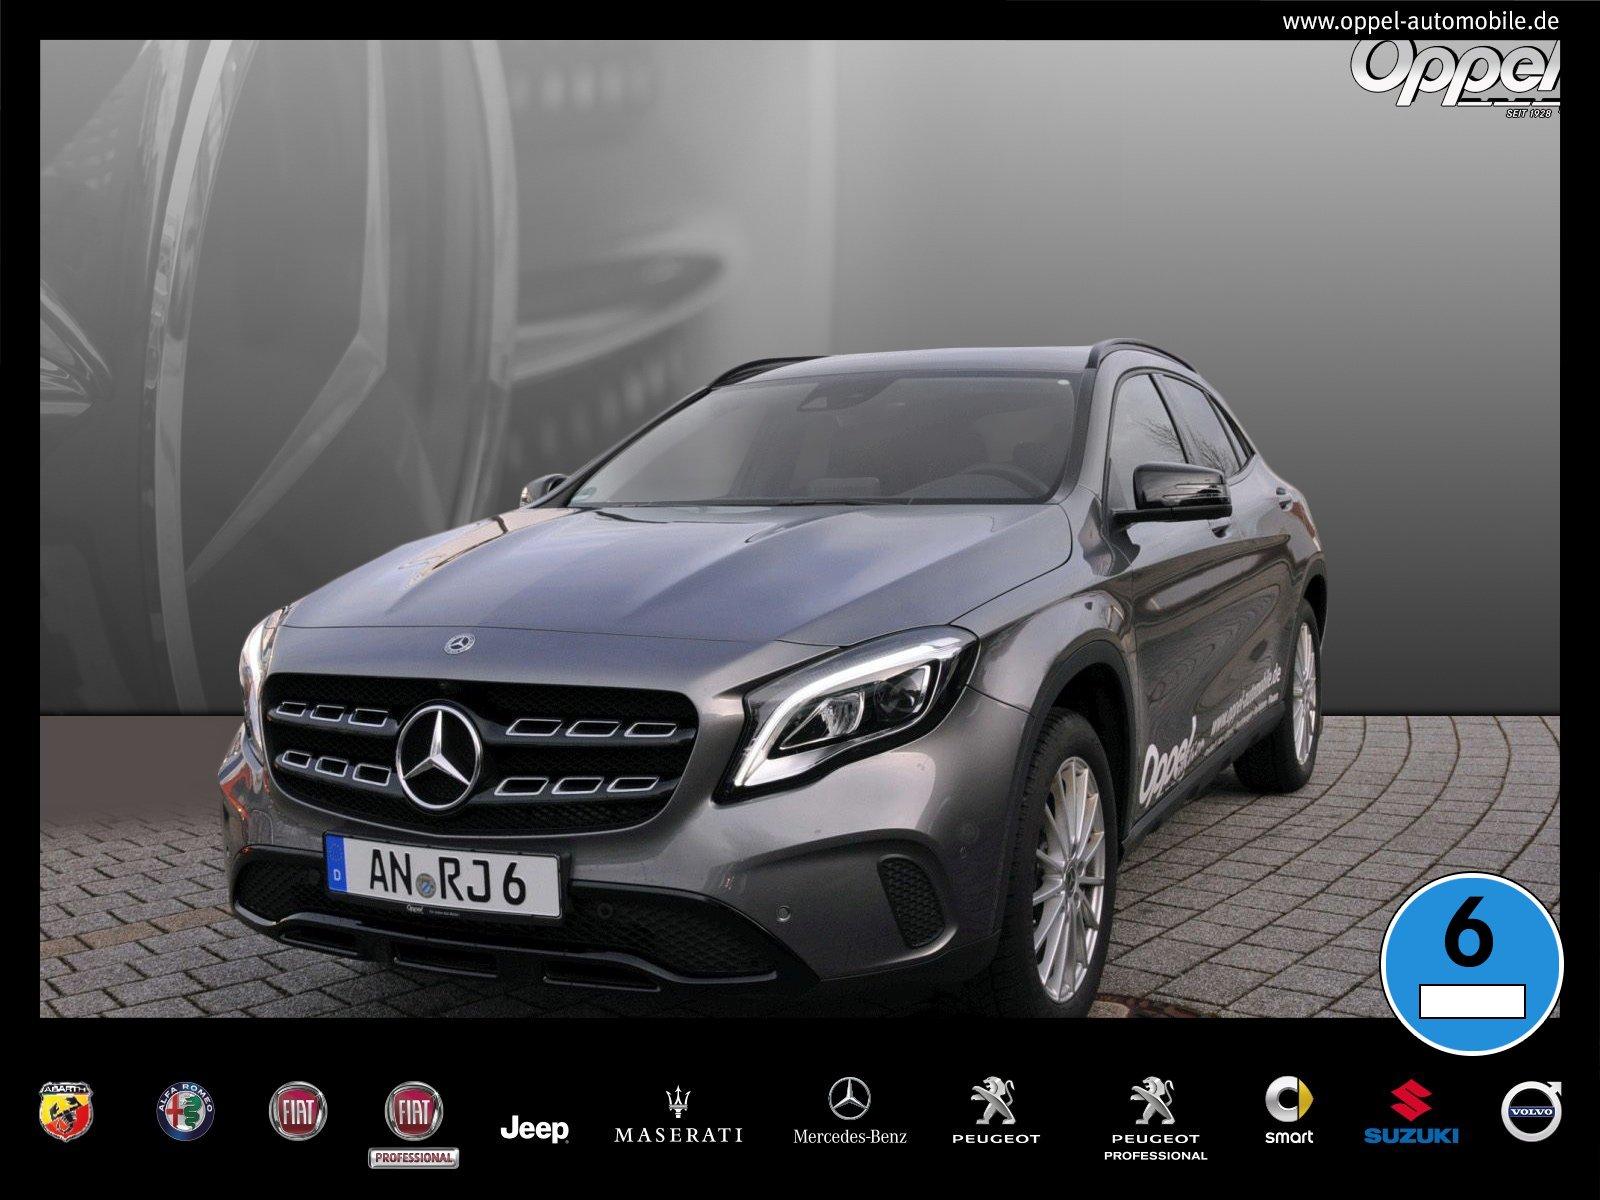 Mercedes-Benz GLA 220 4MATIC Urban +LED+360°-K+NIGHT+AHK+NAVI+, Jahr 2019, Benzin